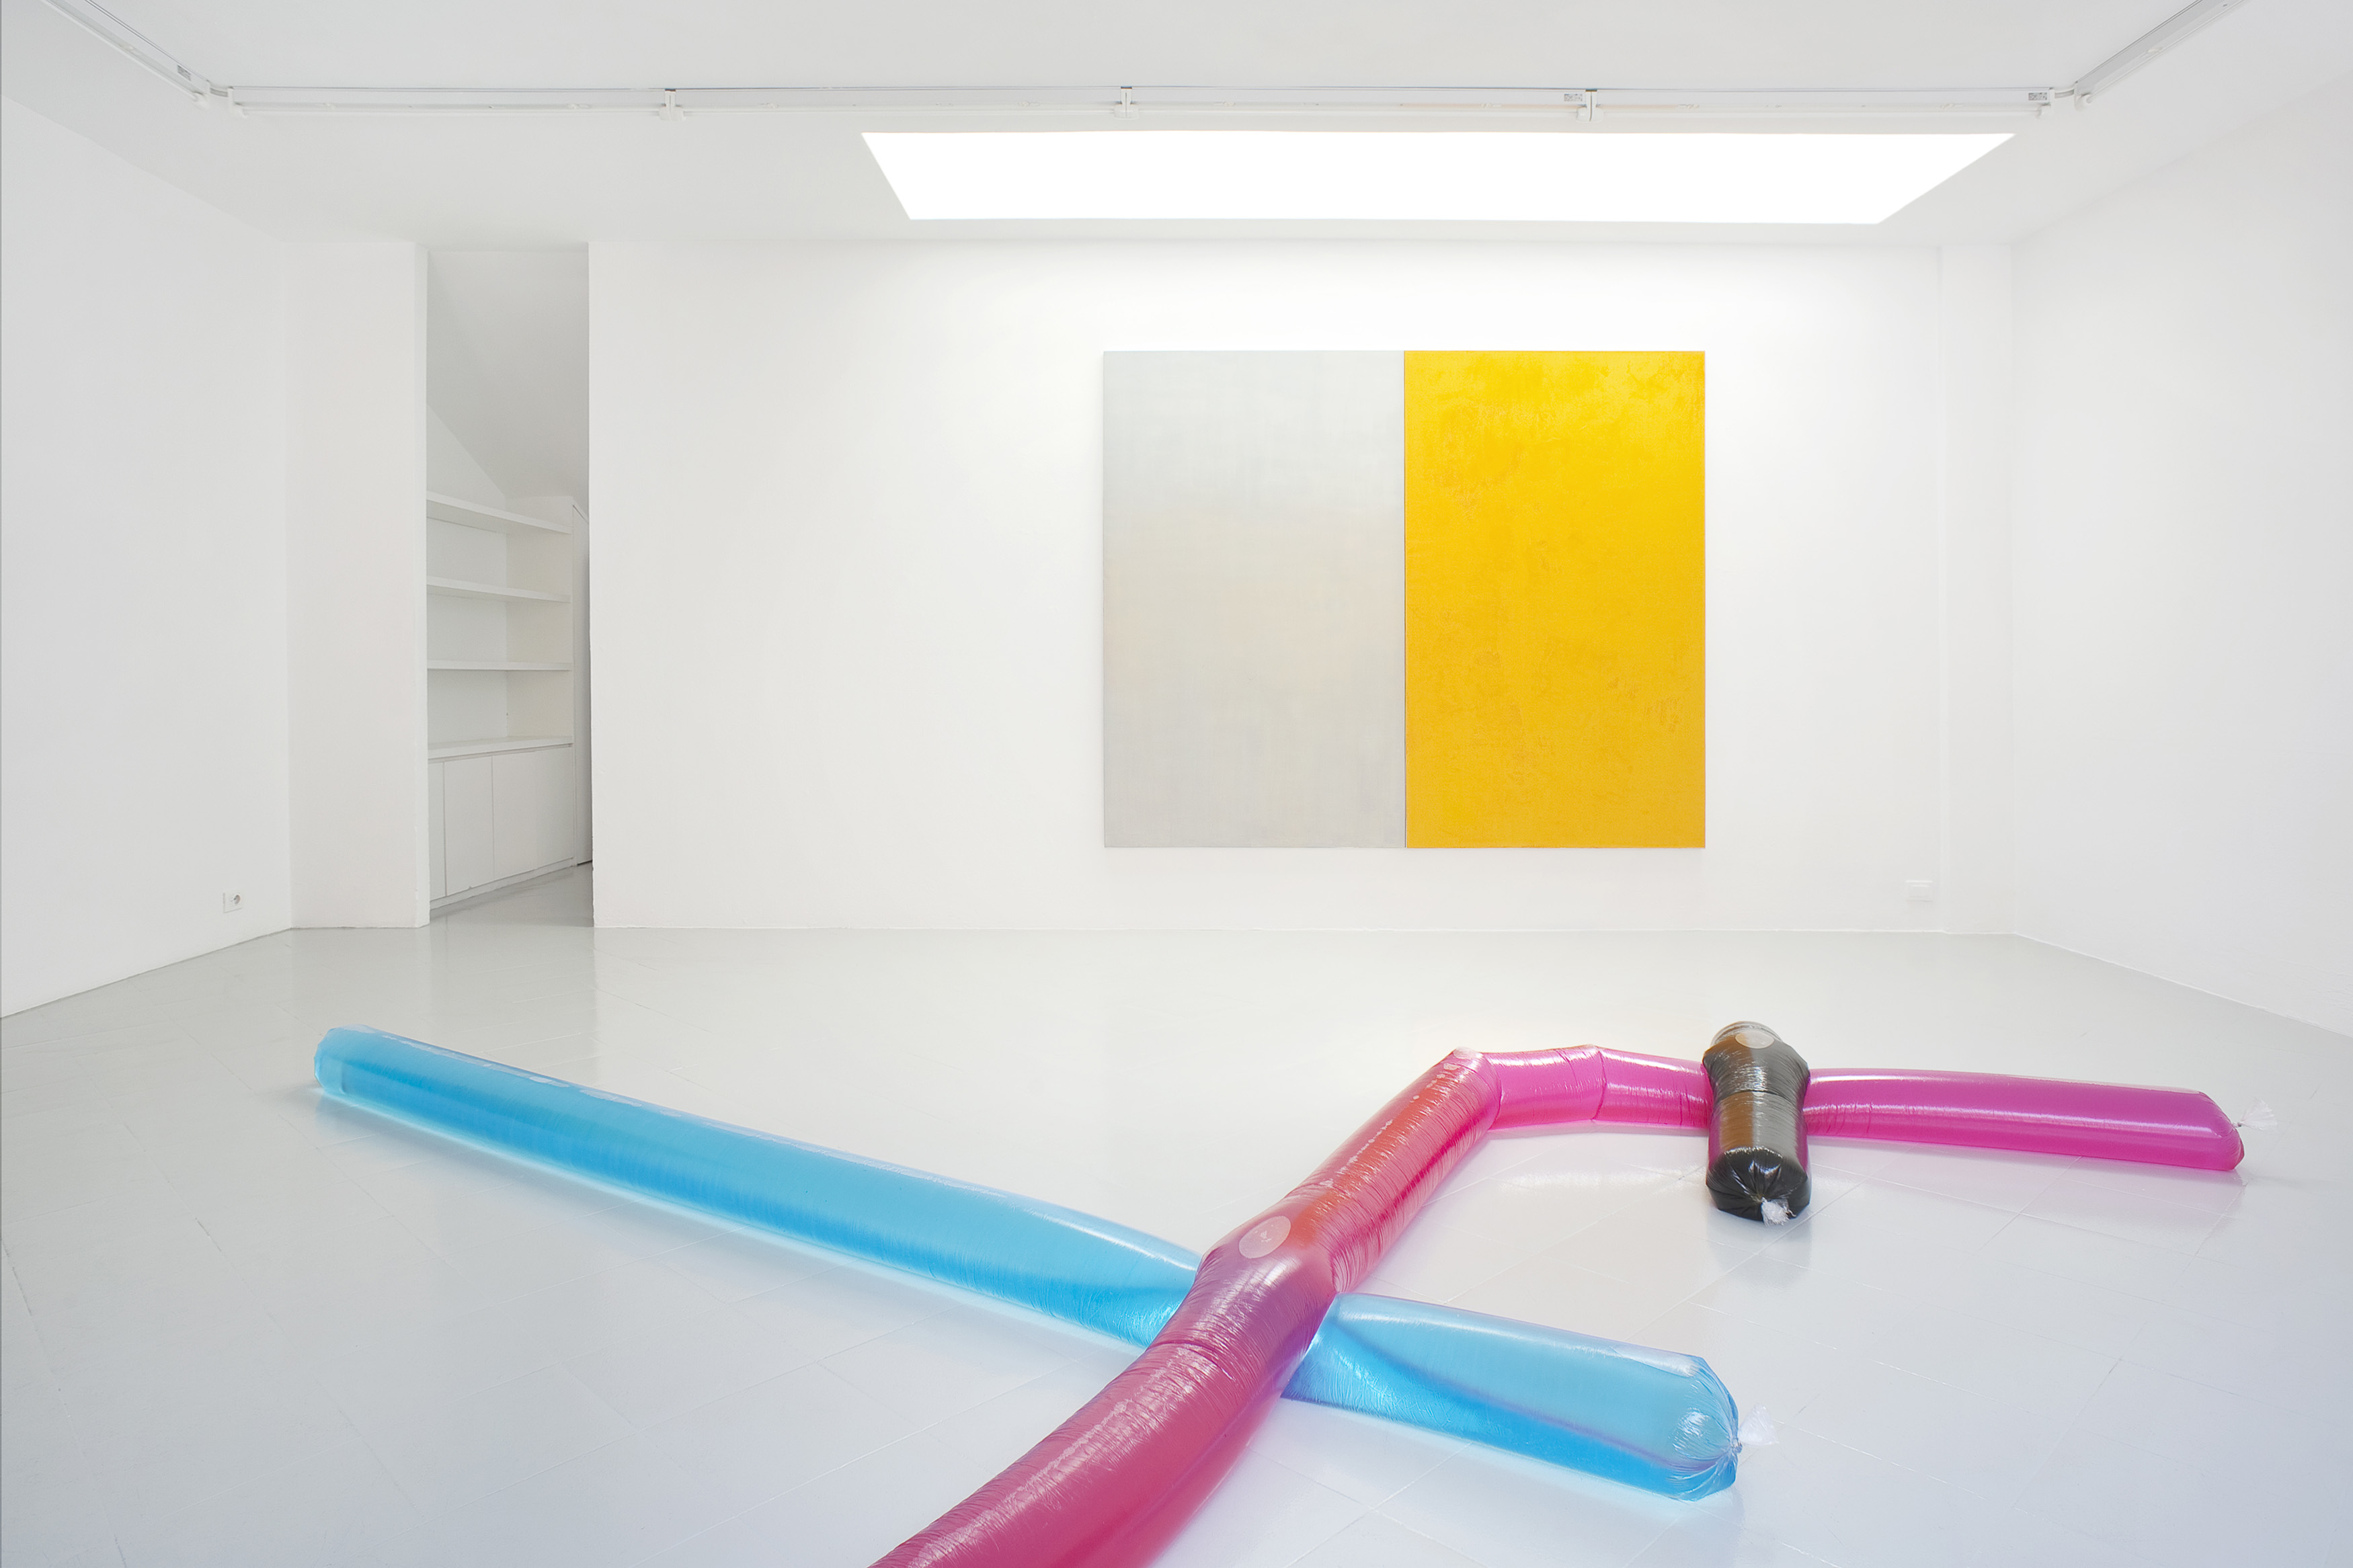 8 - Adrian Buschmann Mia Marfurt Henning Strassburger Tyra Tingleff Installation View 2015 - Courtesy Studiolo Milan Photo Filippo Armellin